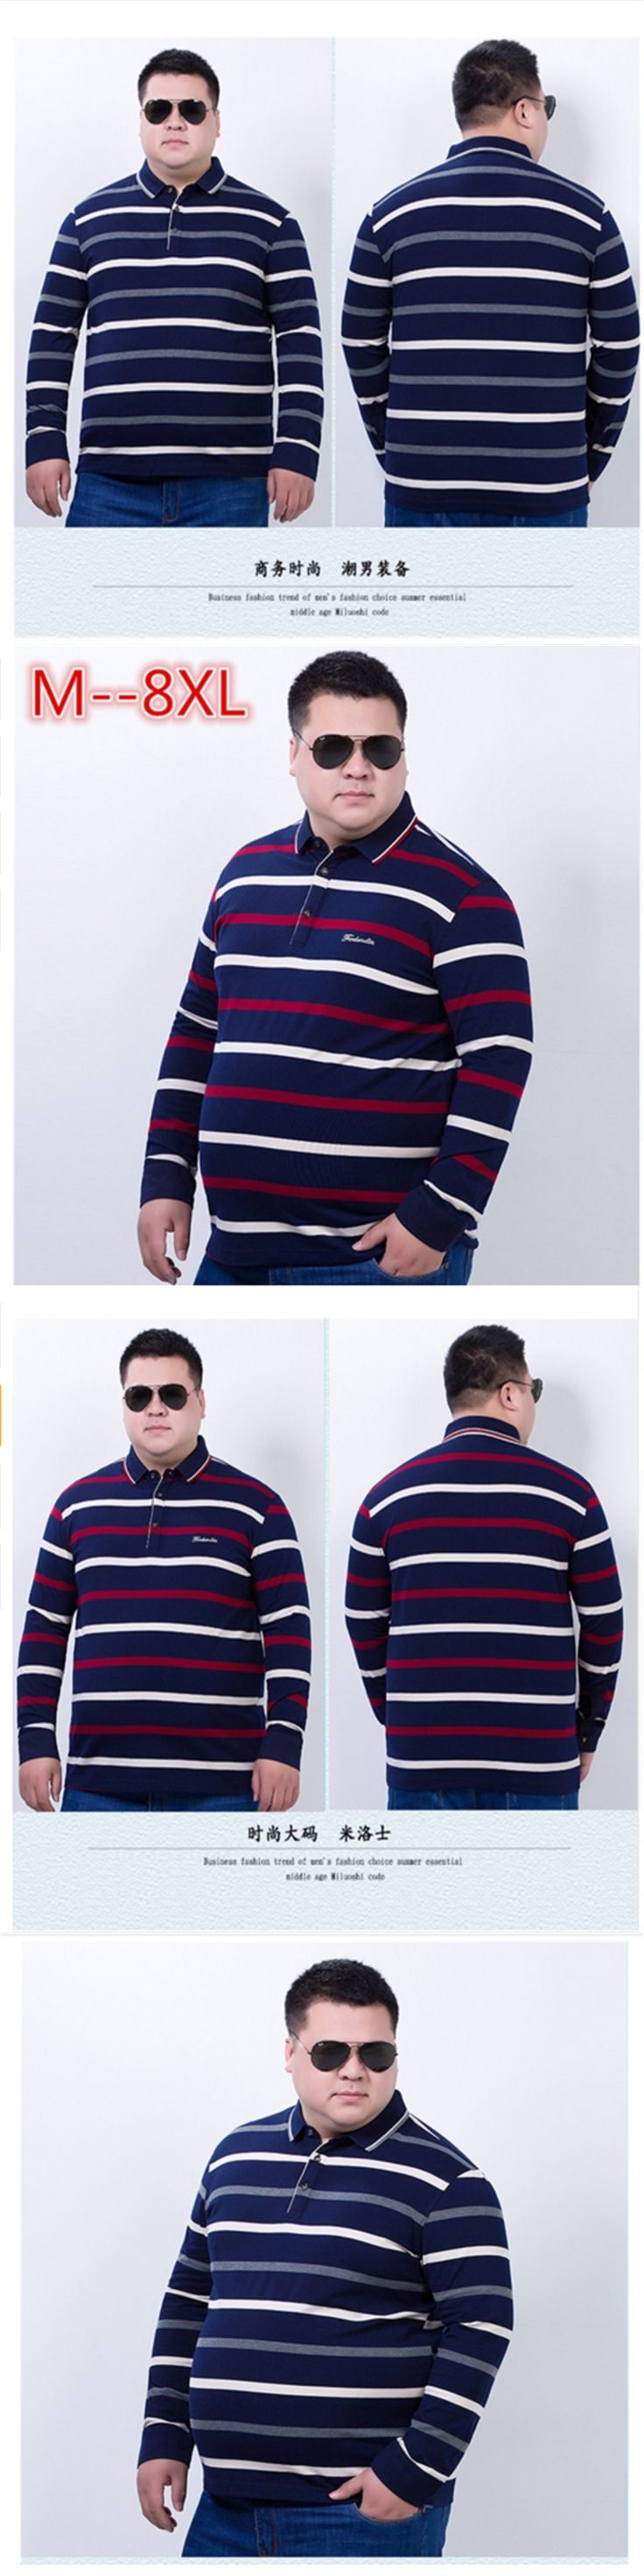 2017 new 8XL 6XL 5XL 4XL Men's Long Sleeved Polo Shirt Plus Size Striped Stand Collar Cotton POLO Shirts Casual Mens Lapel Polo